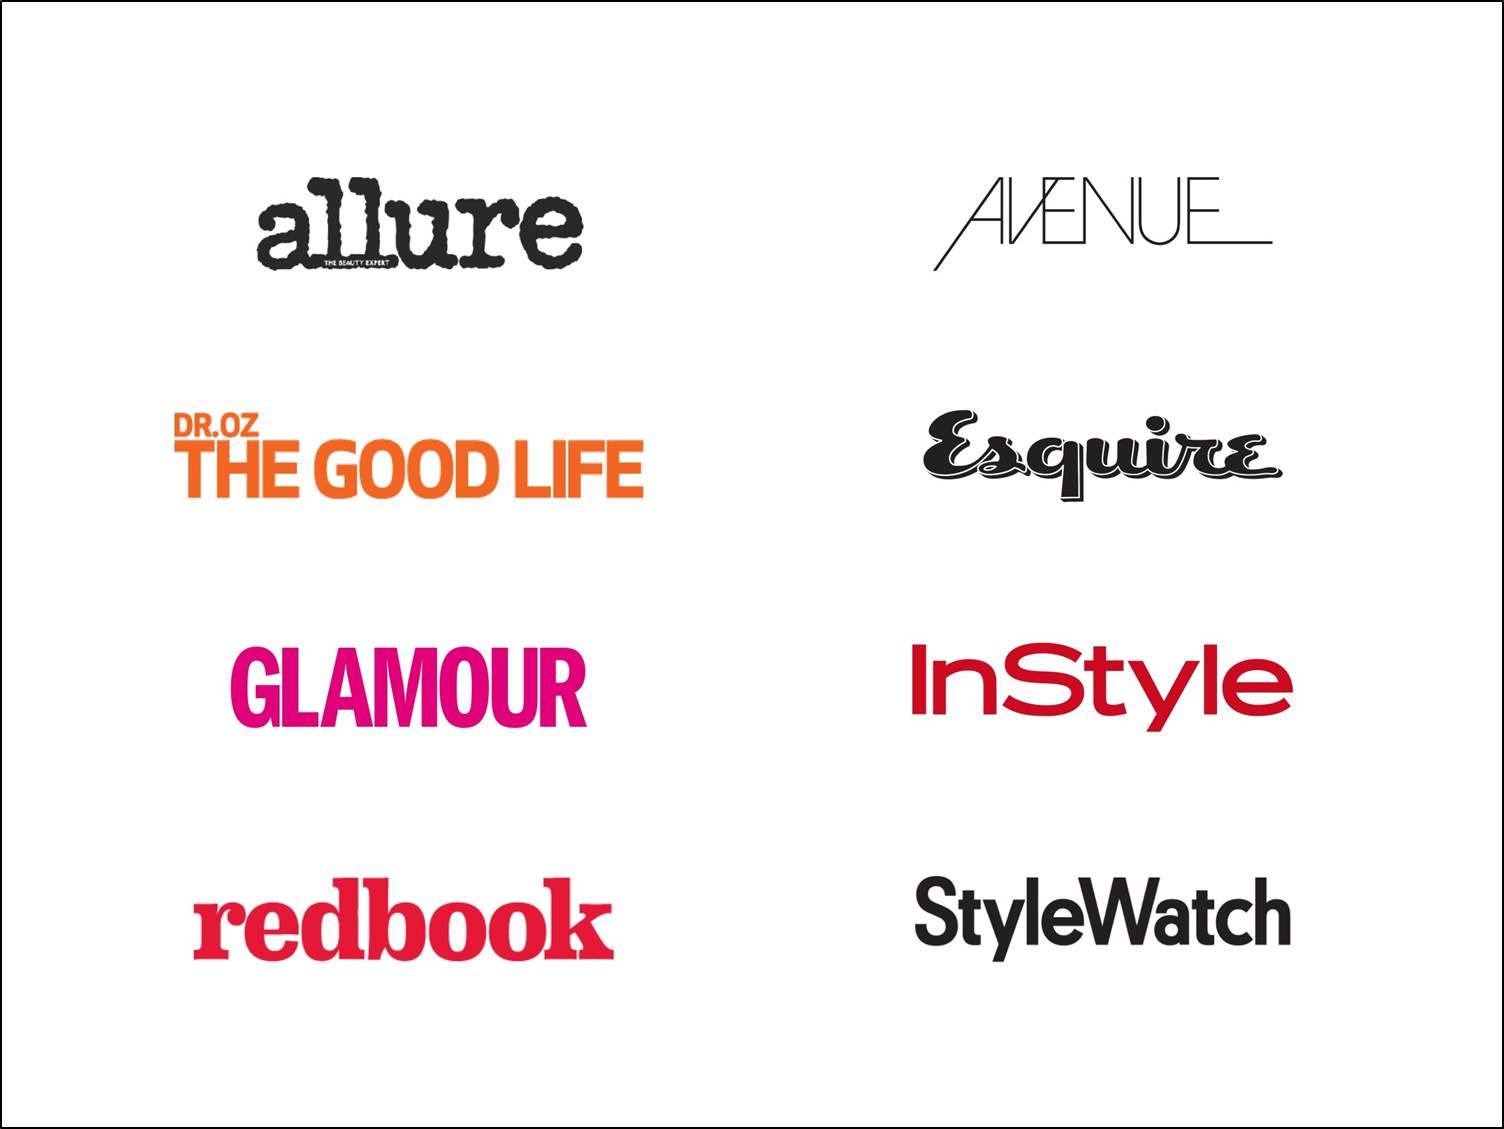 magazine_logos_PSA